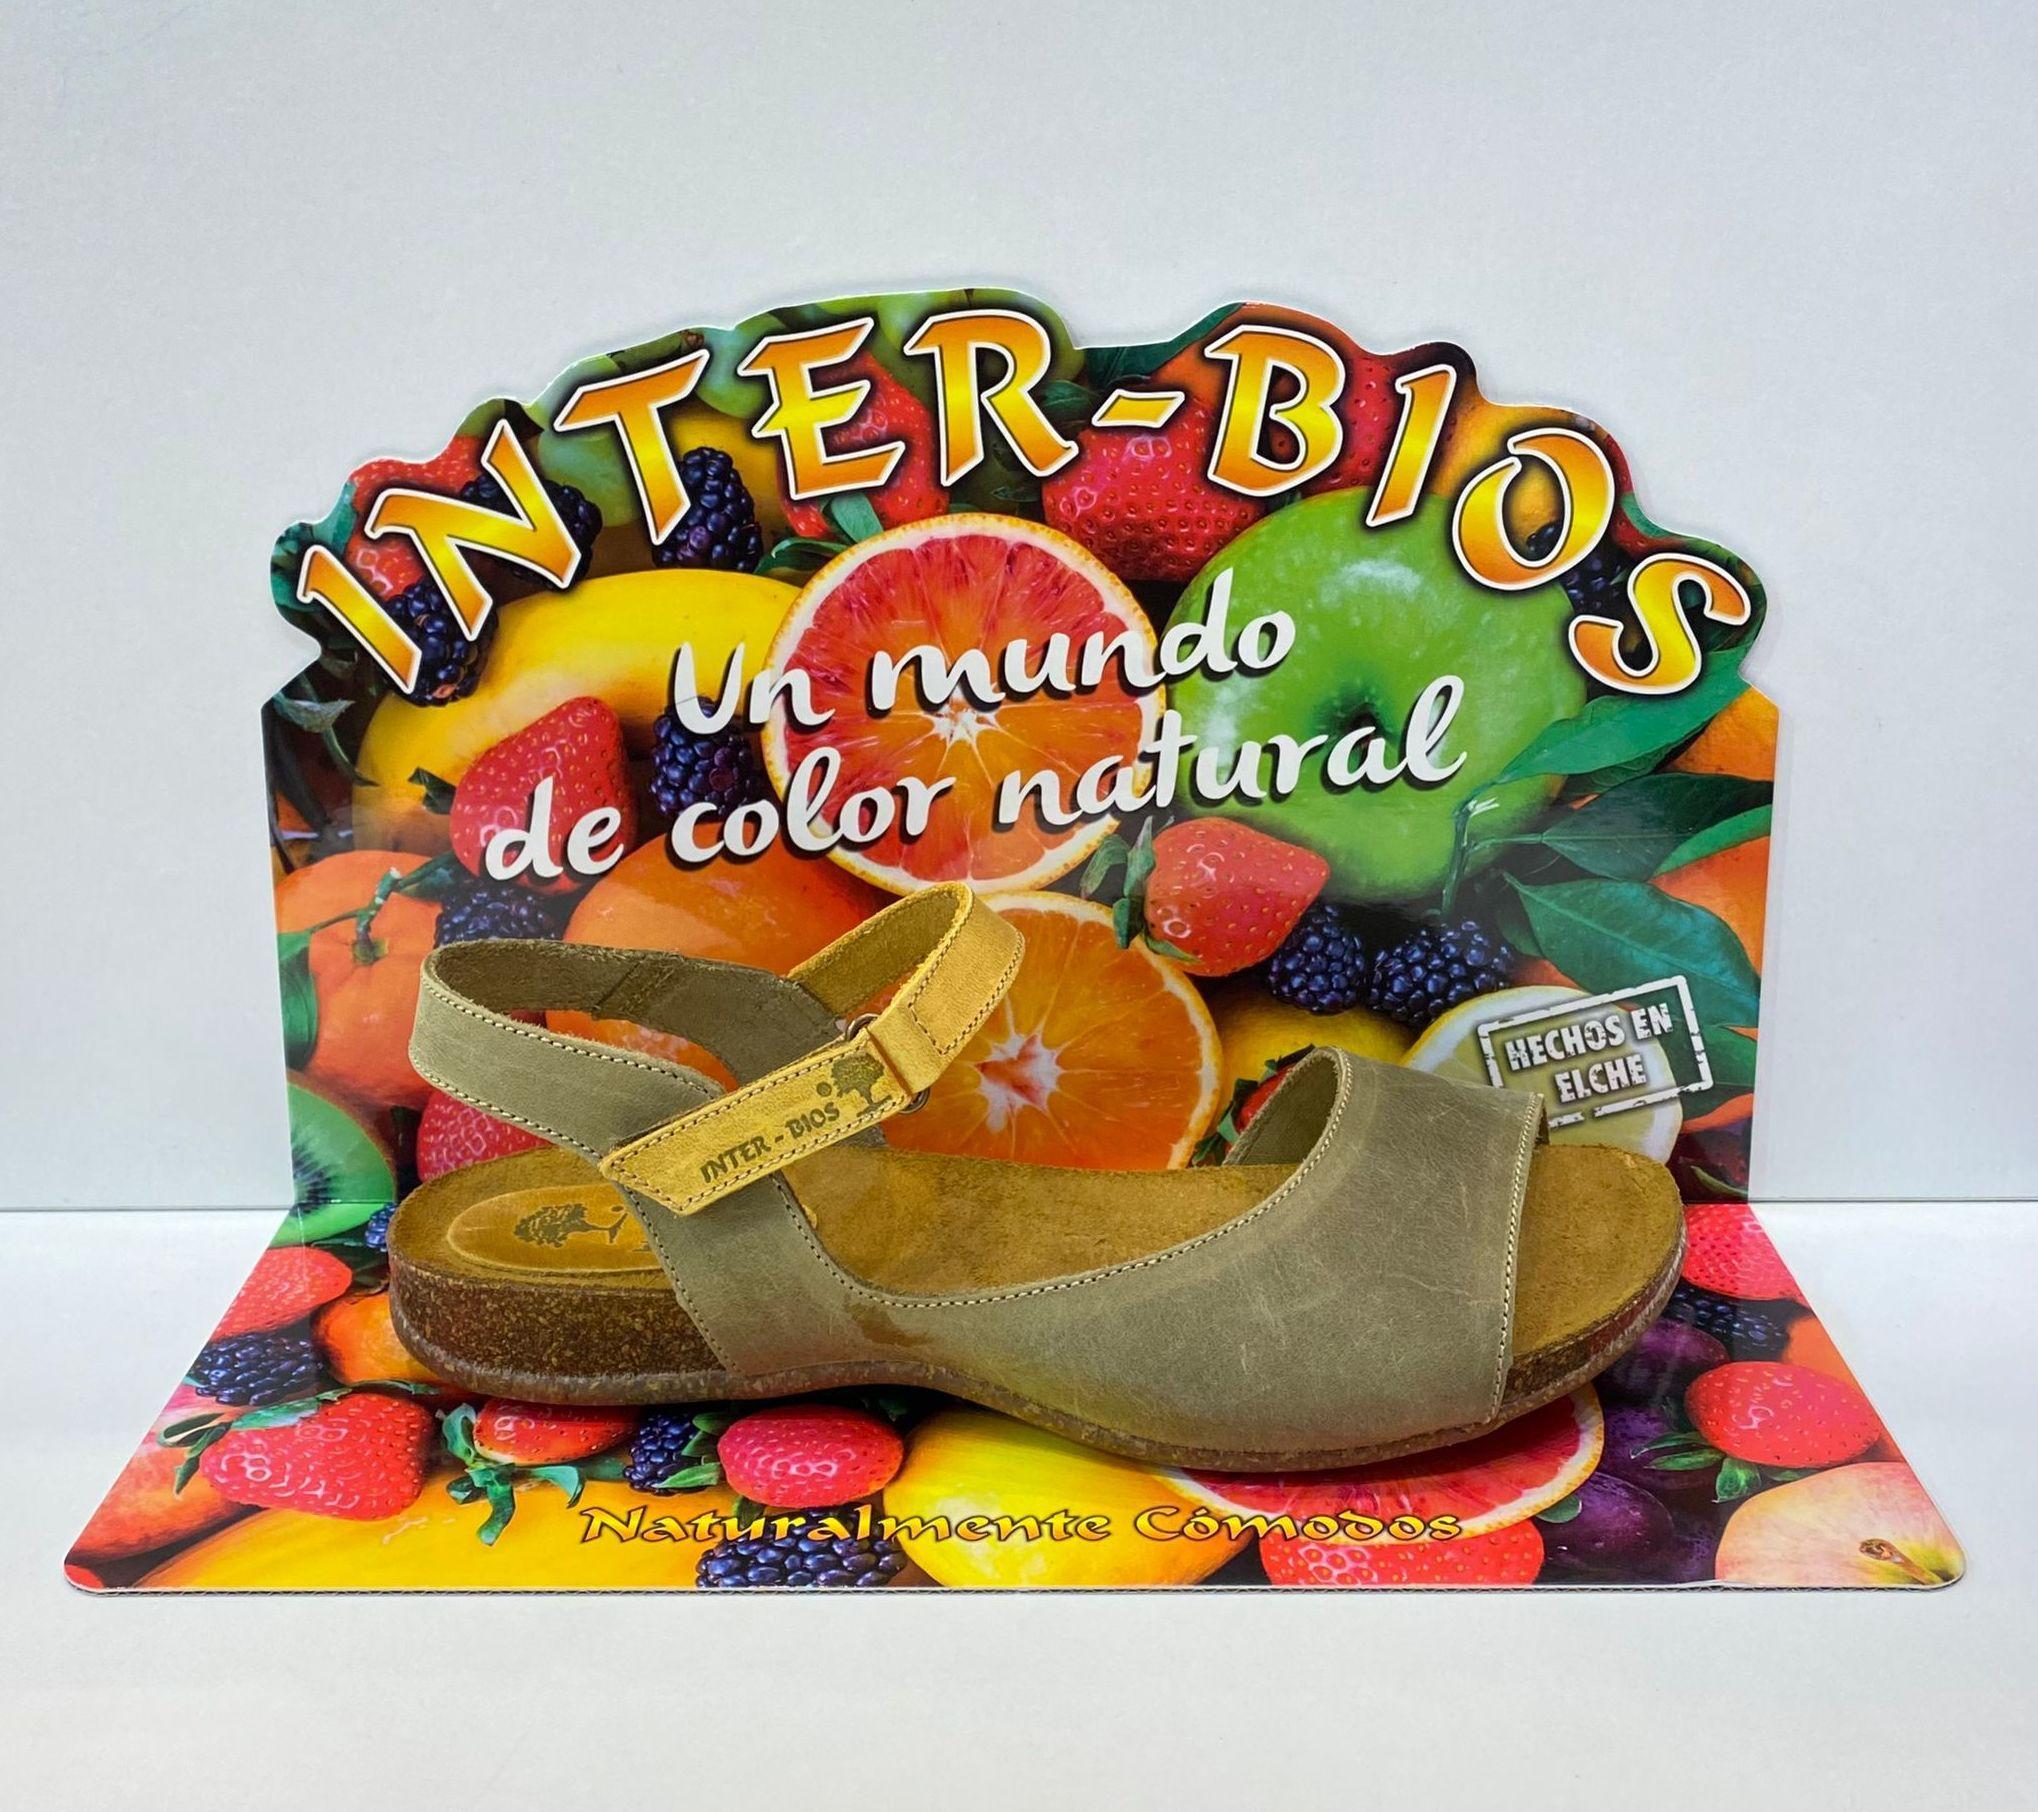 Sandàlia de dona, tipus bio, de la marca Inter-Bios, adaptable a totes les amplades, plantilla anatòmica encoixinada 50€ www.calzadosllinas.es